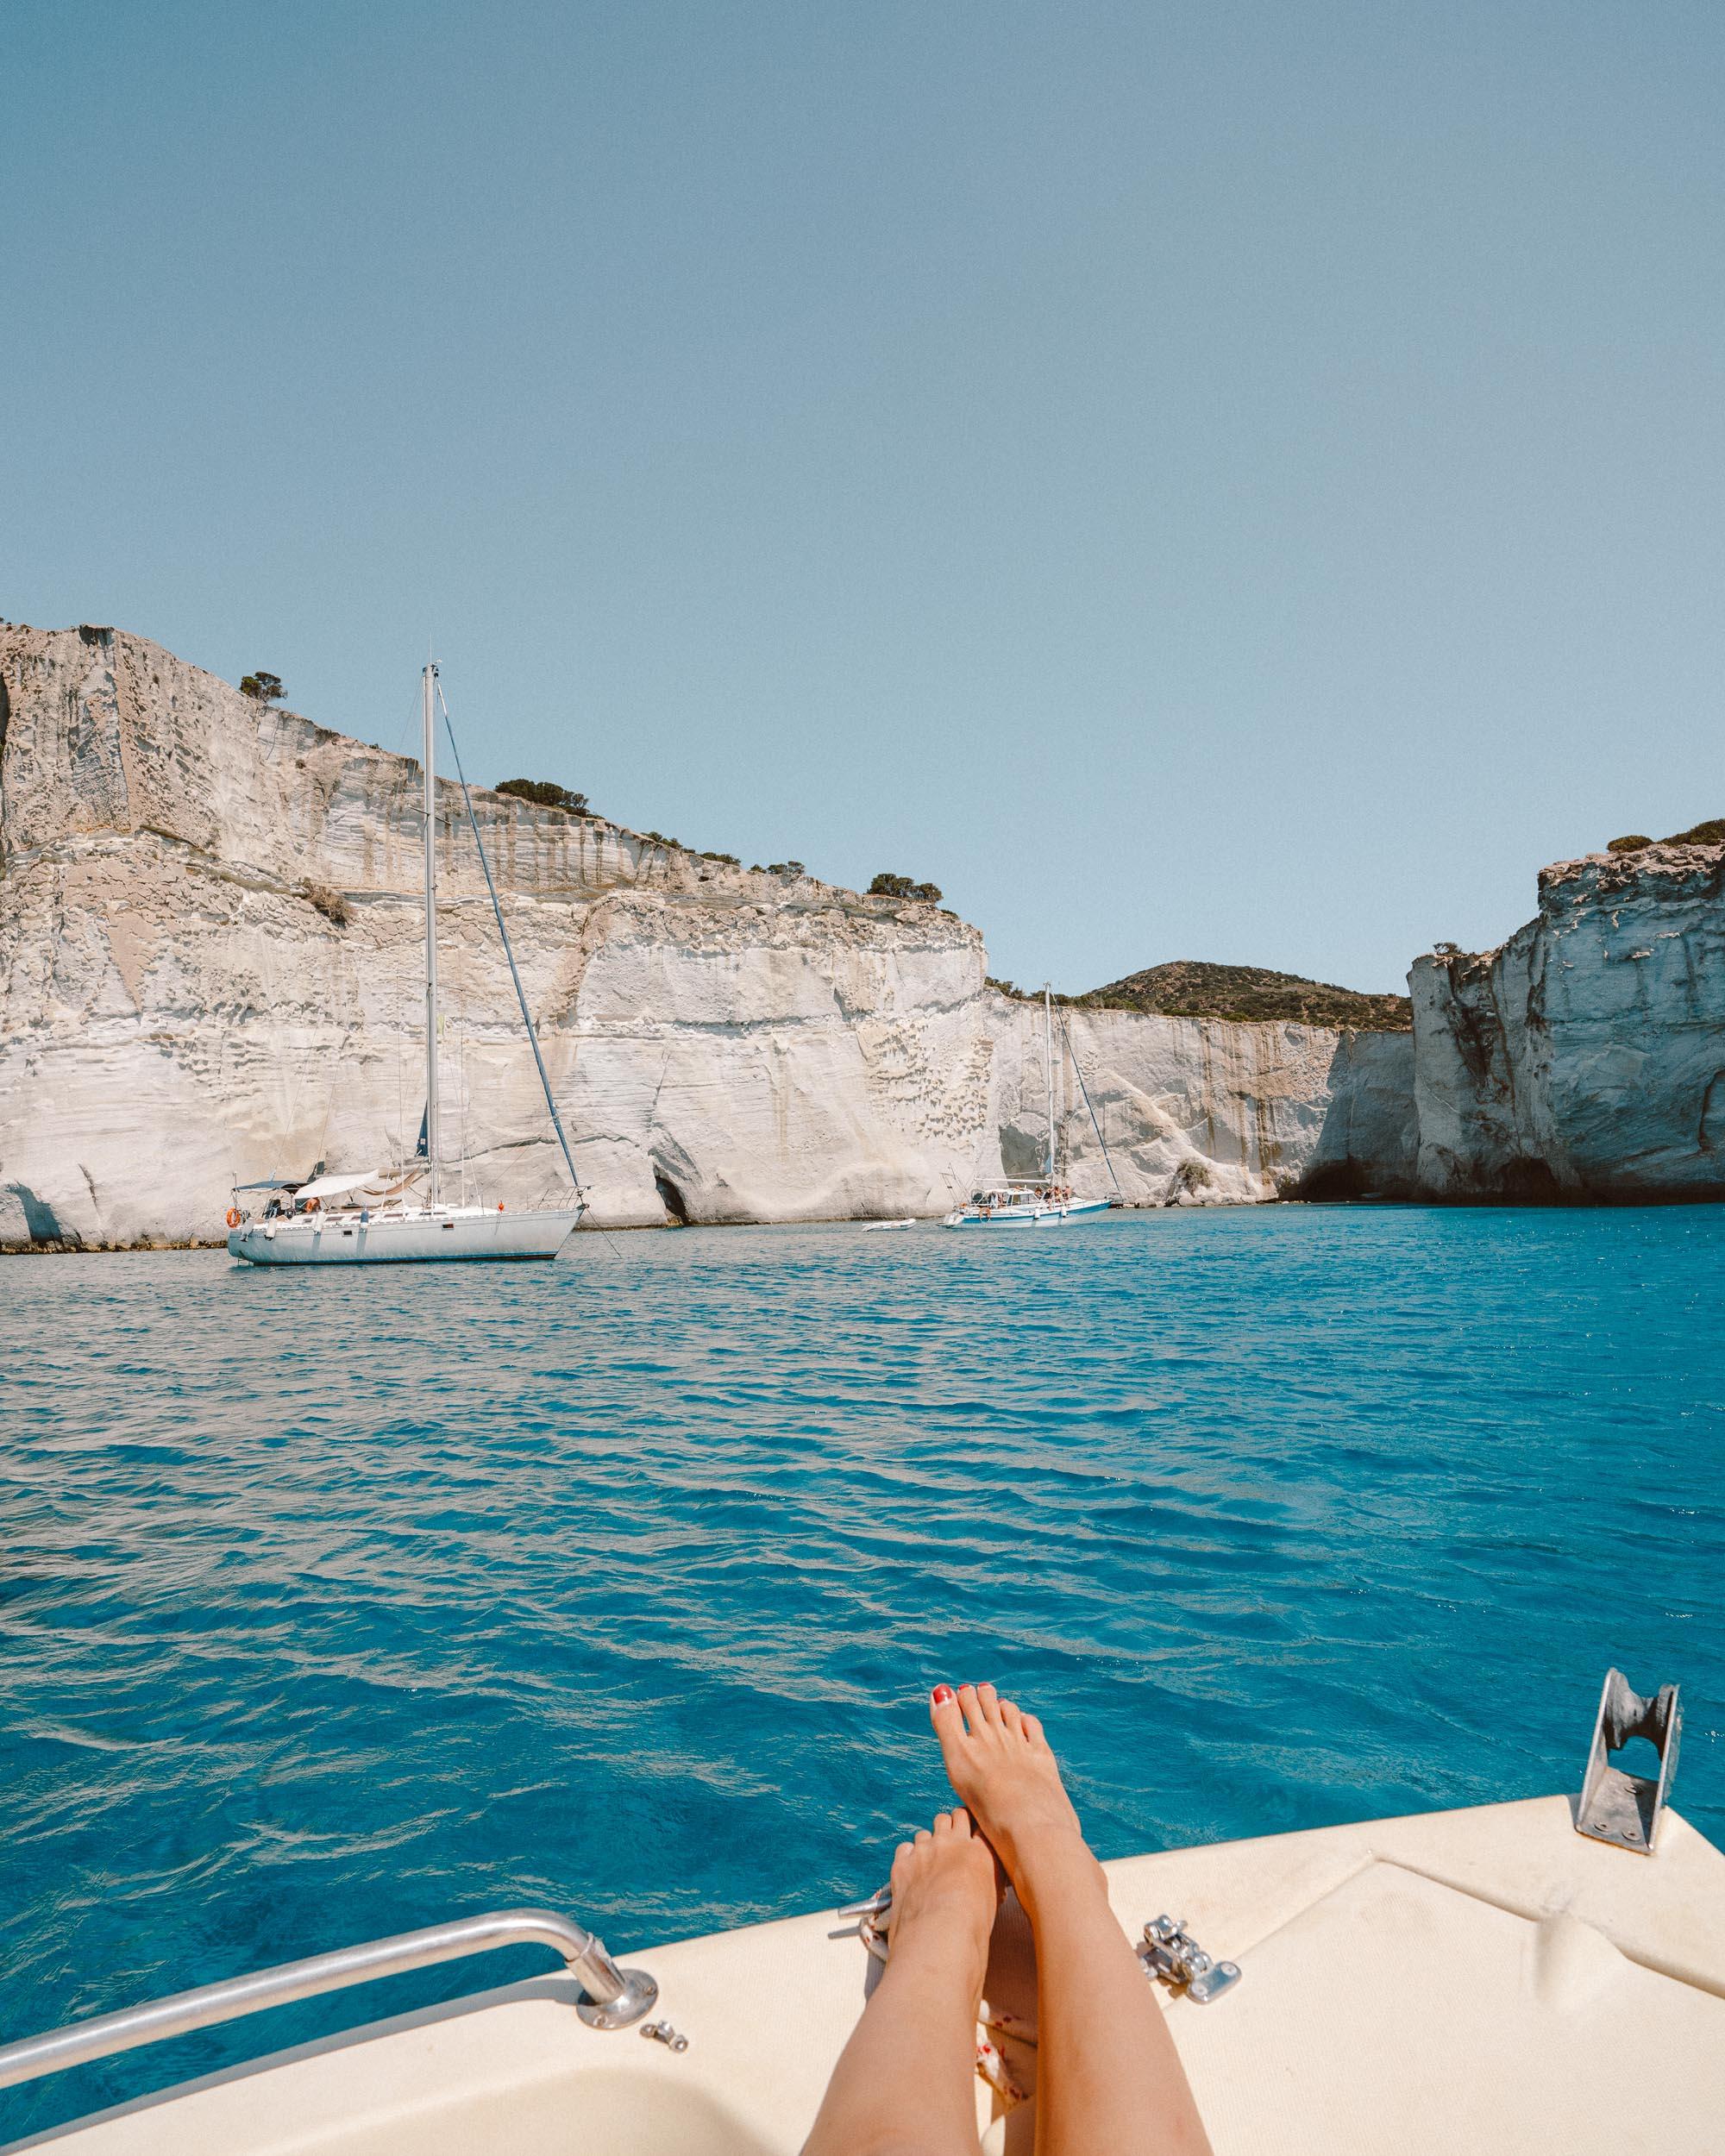 Boat day visiting Kleftiko in Milos Greece via @finduslost